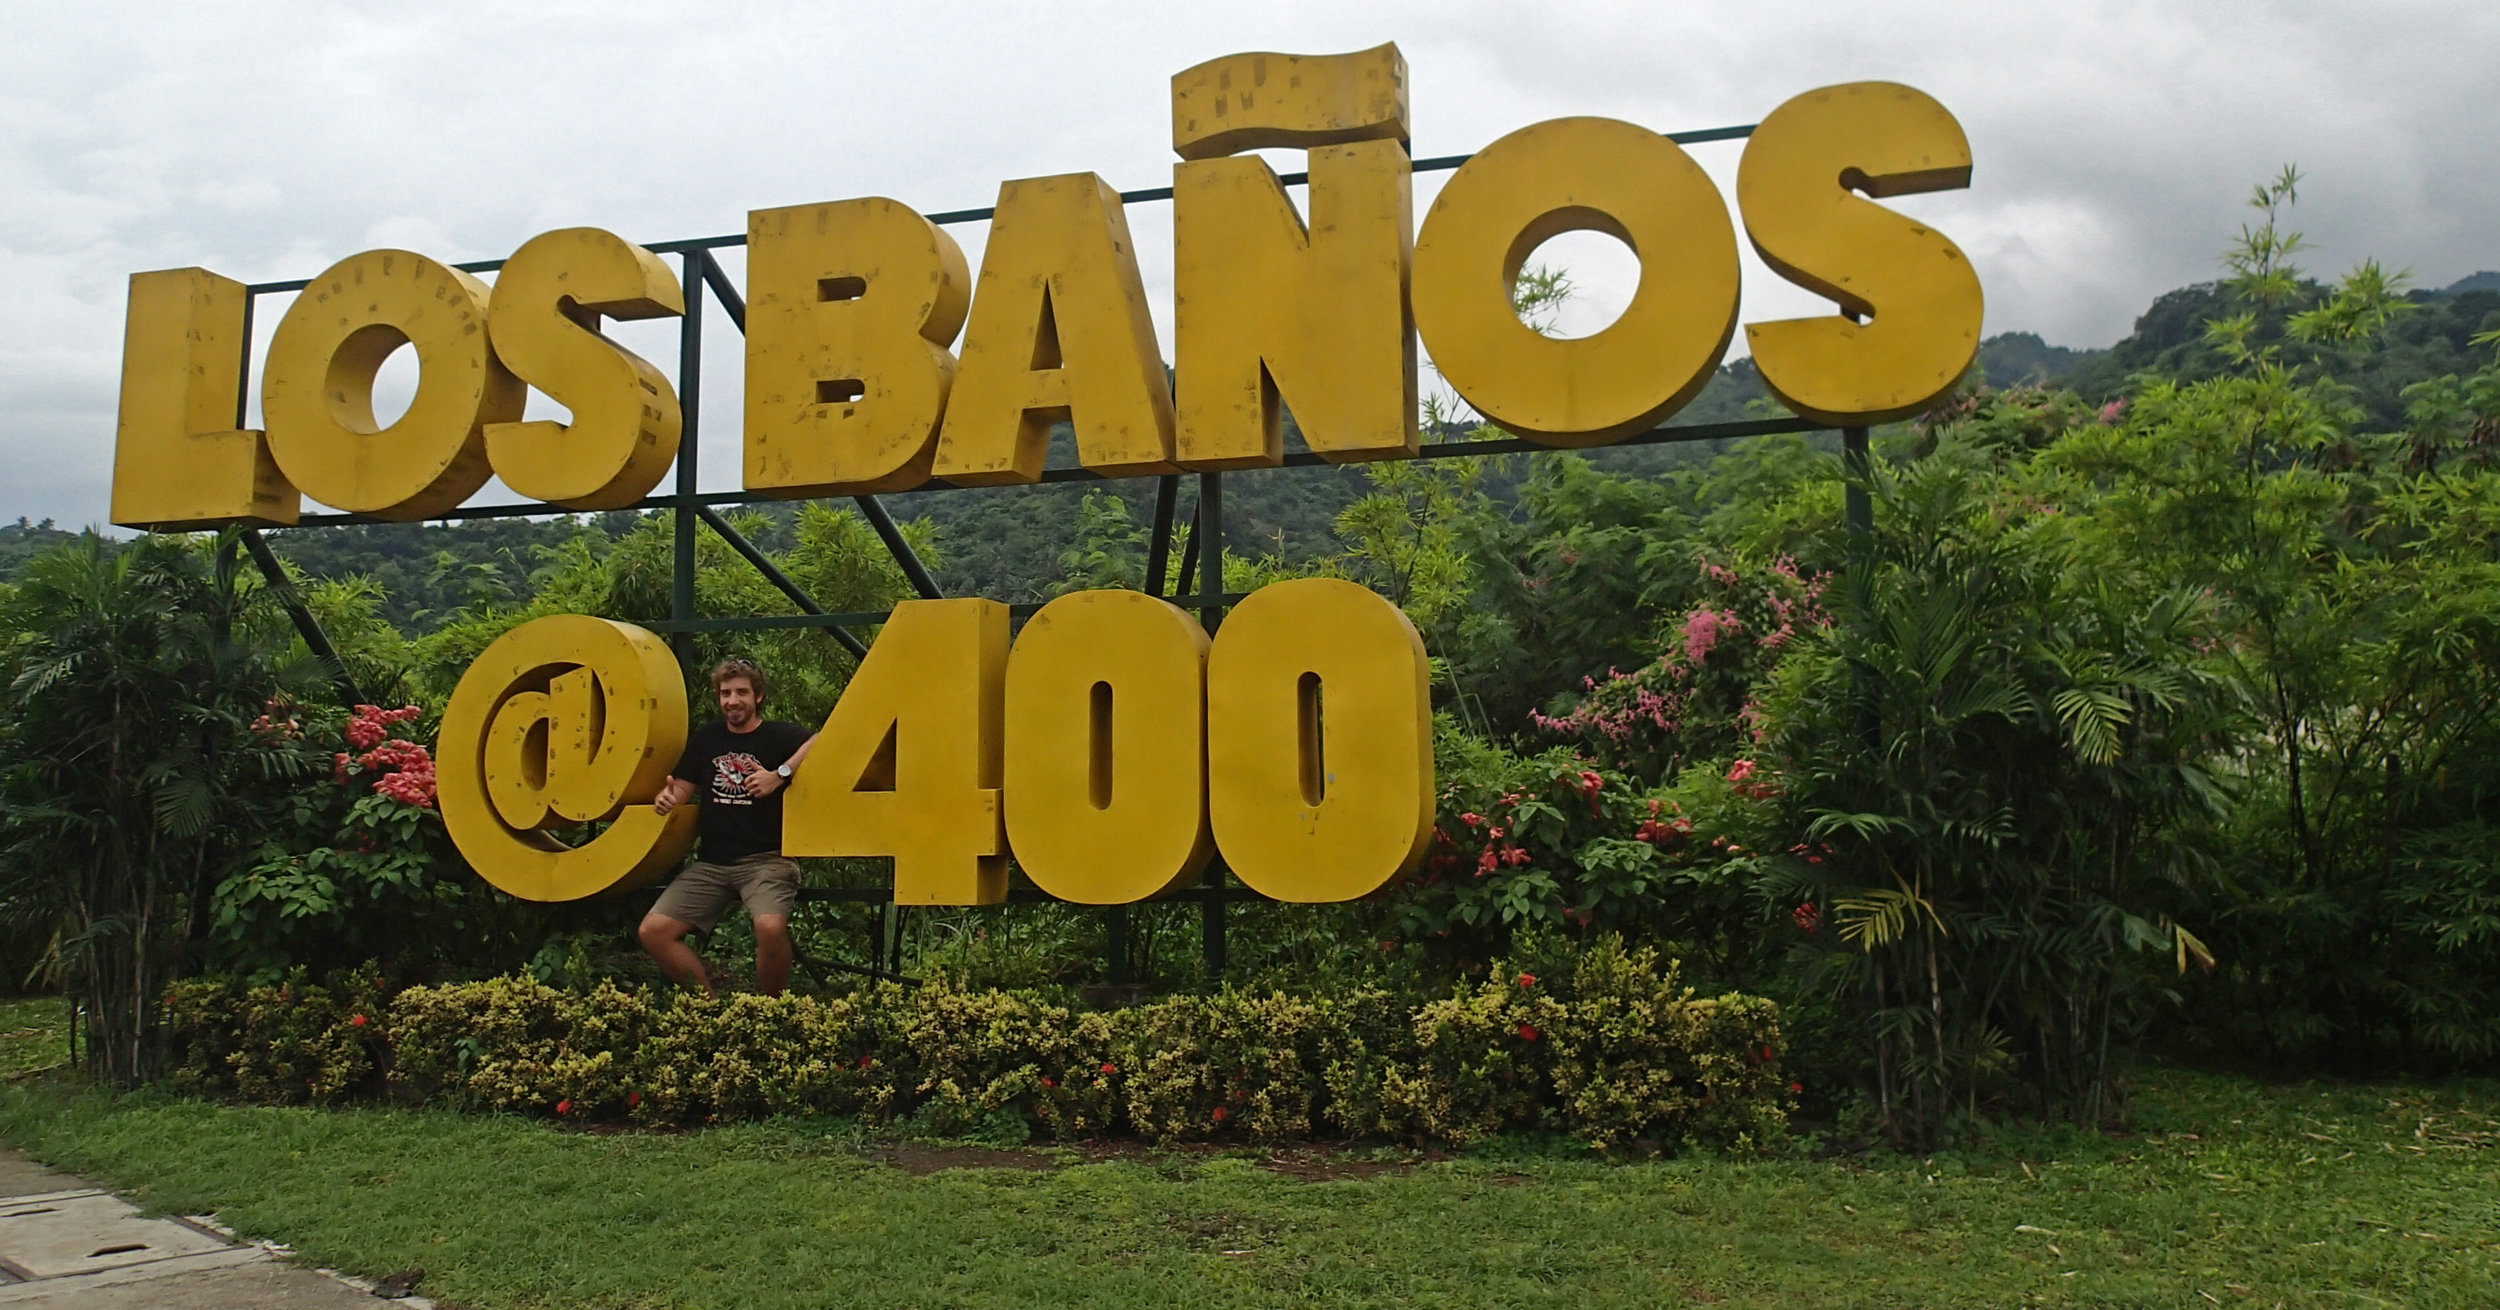 bear in Los Banos.jpg